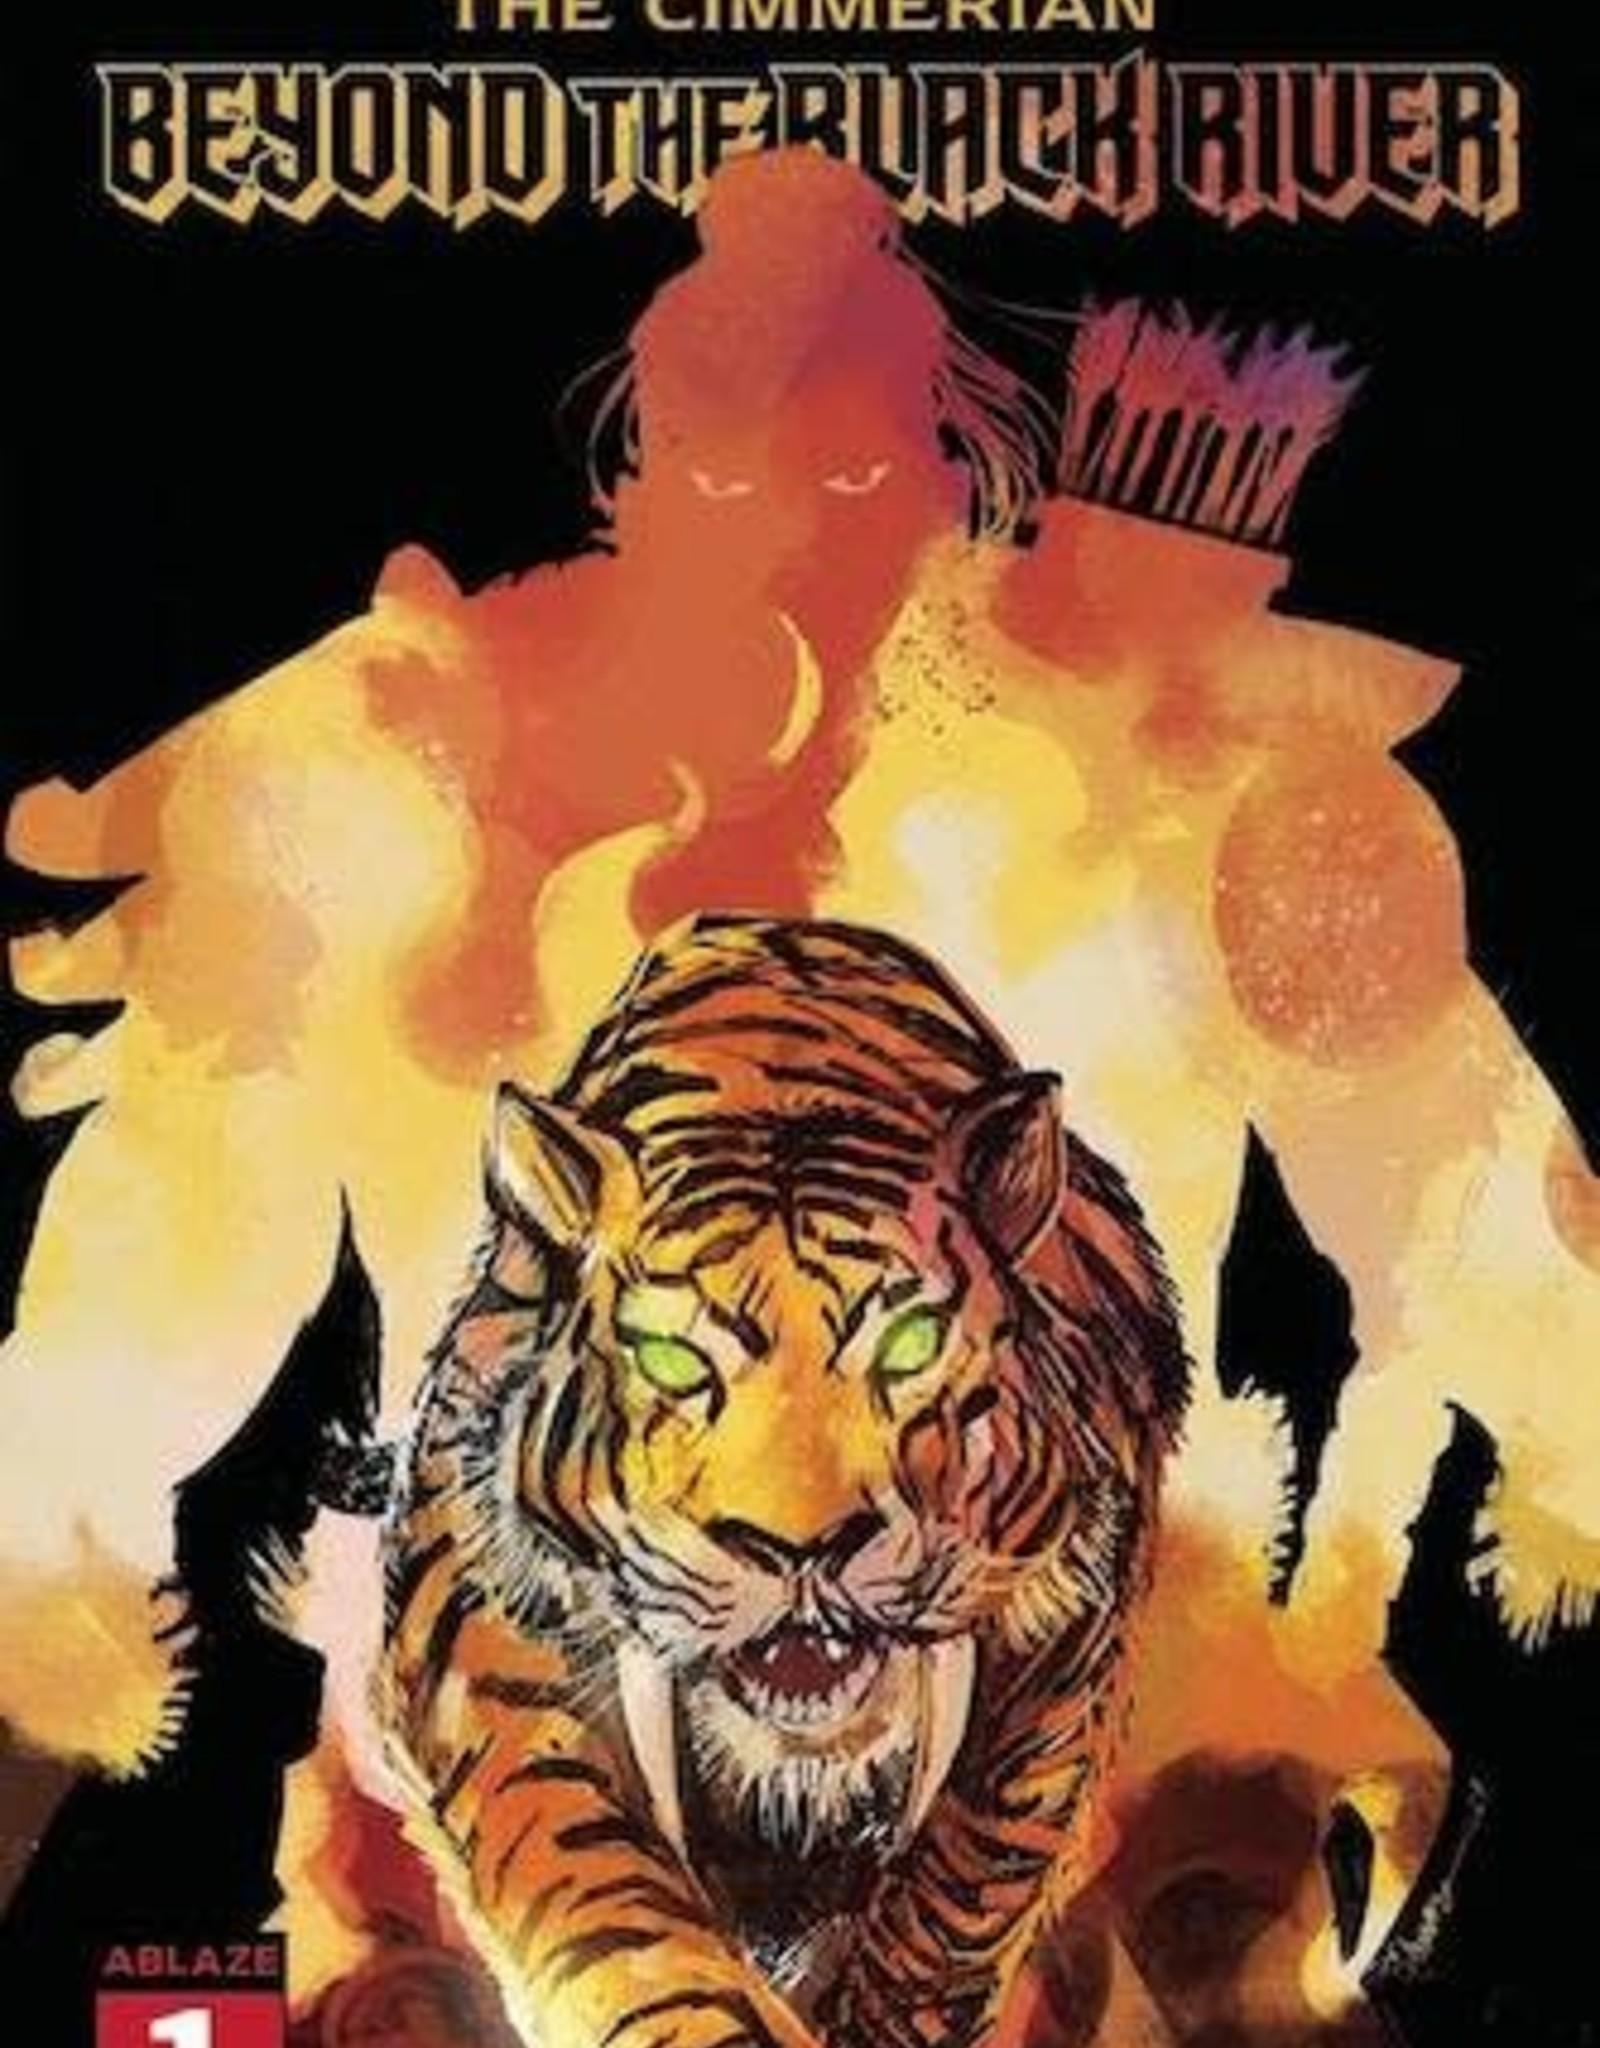 Ablaze Cimmerian Beyond The Black River #1 Cvr C Tamura